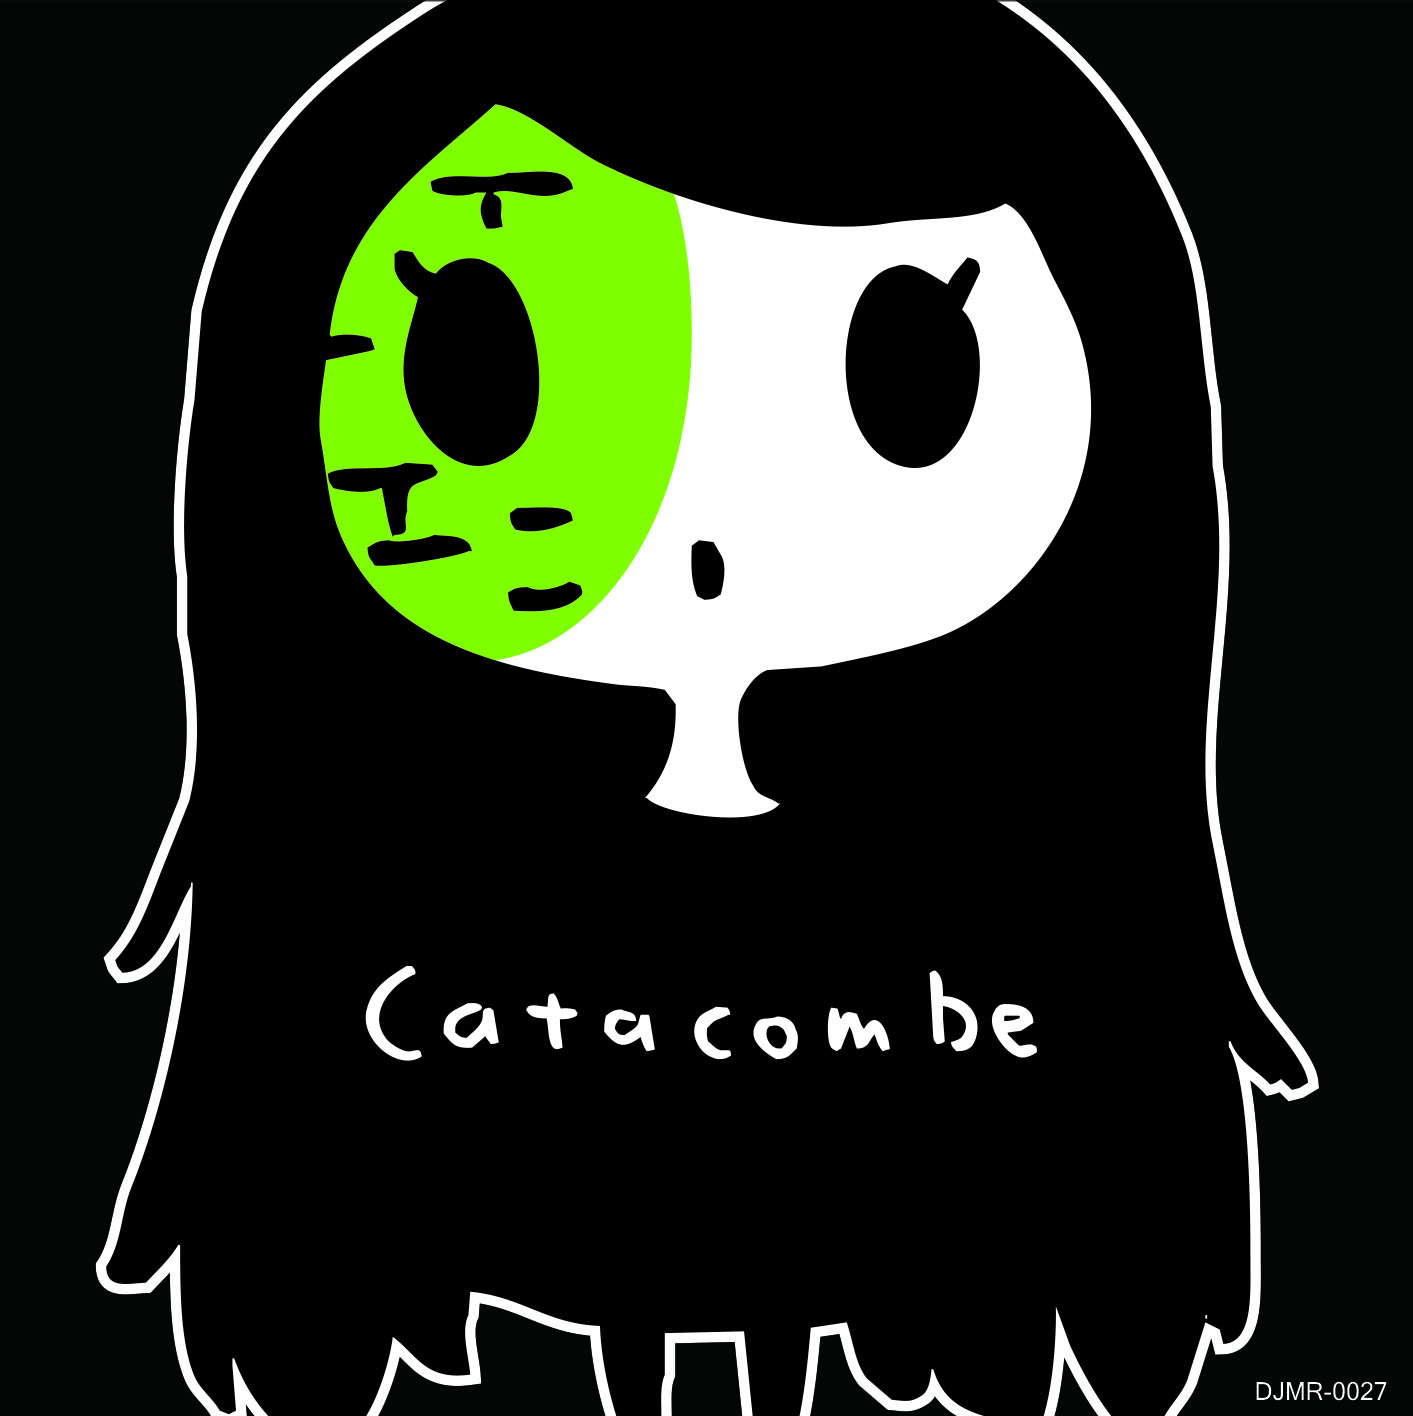 DJMR0025catacombe2